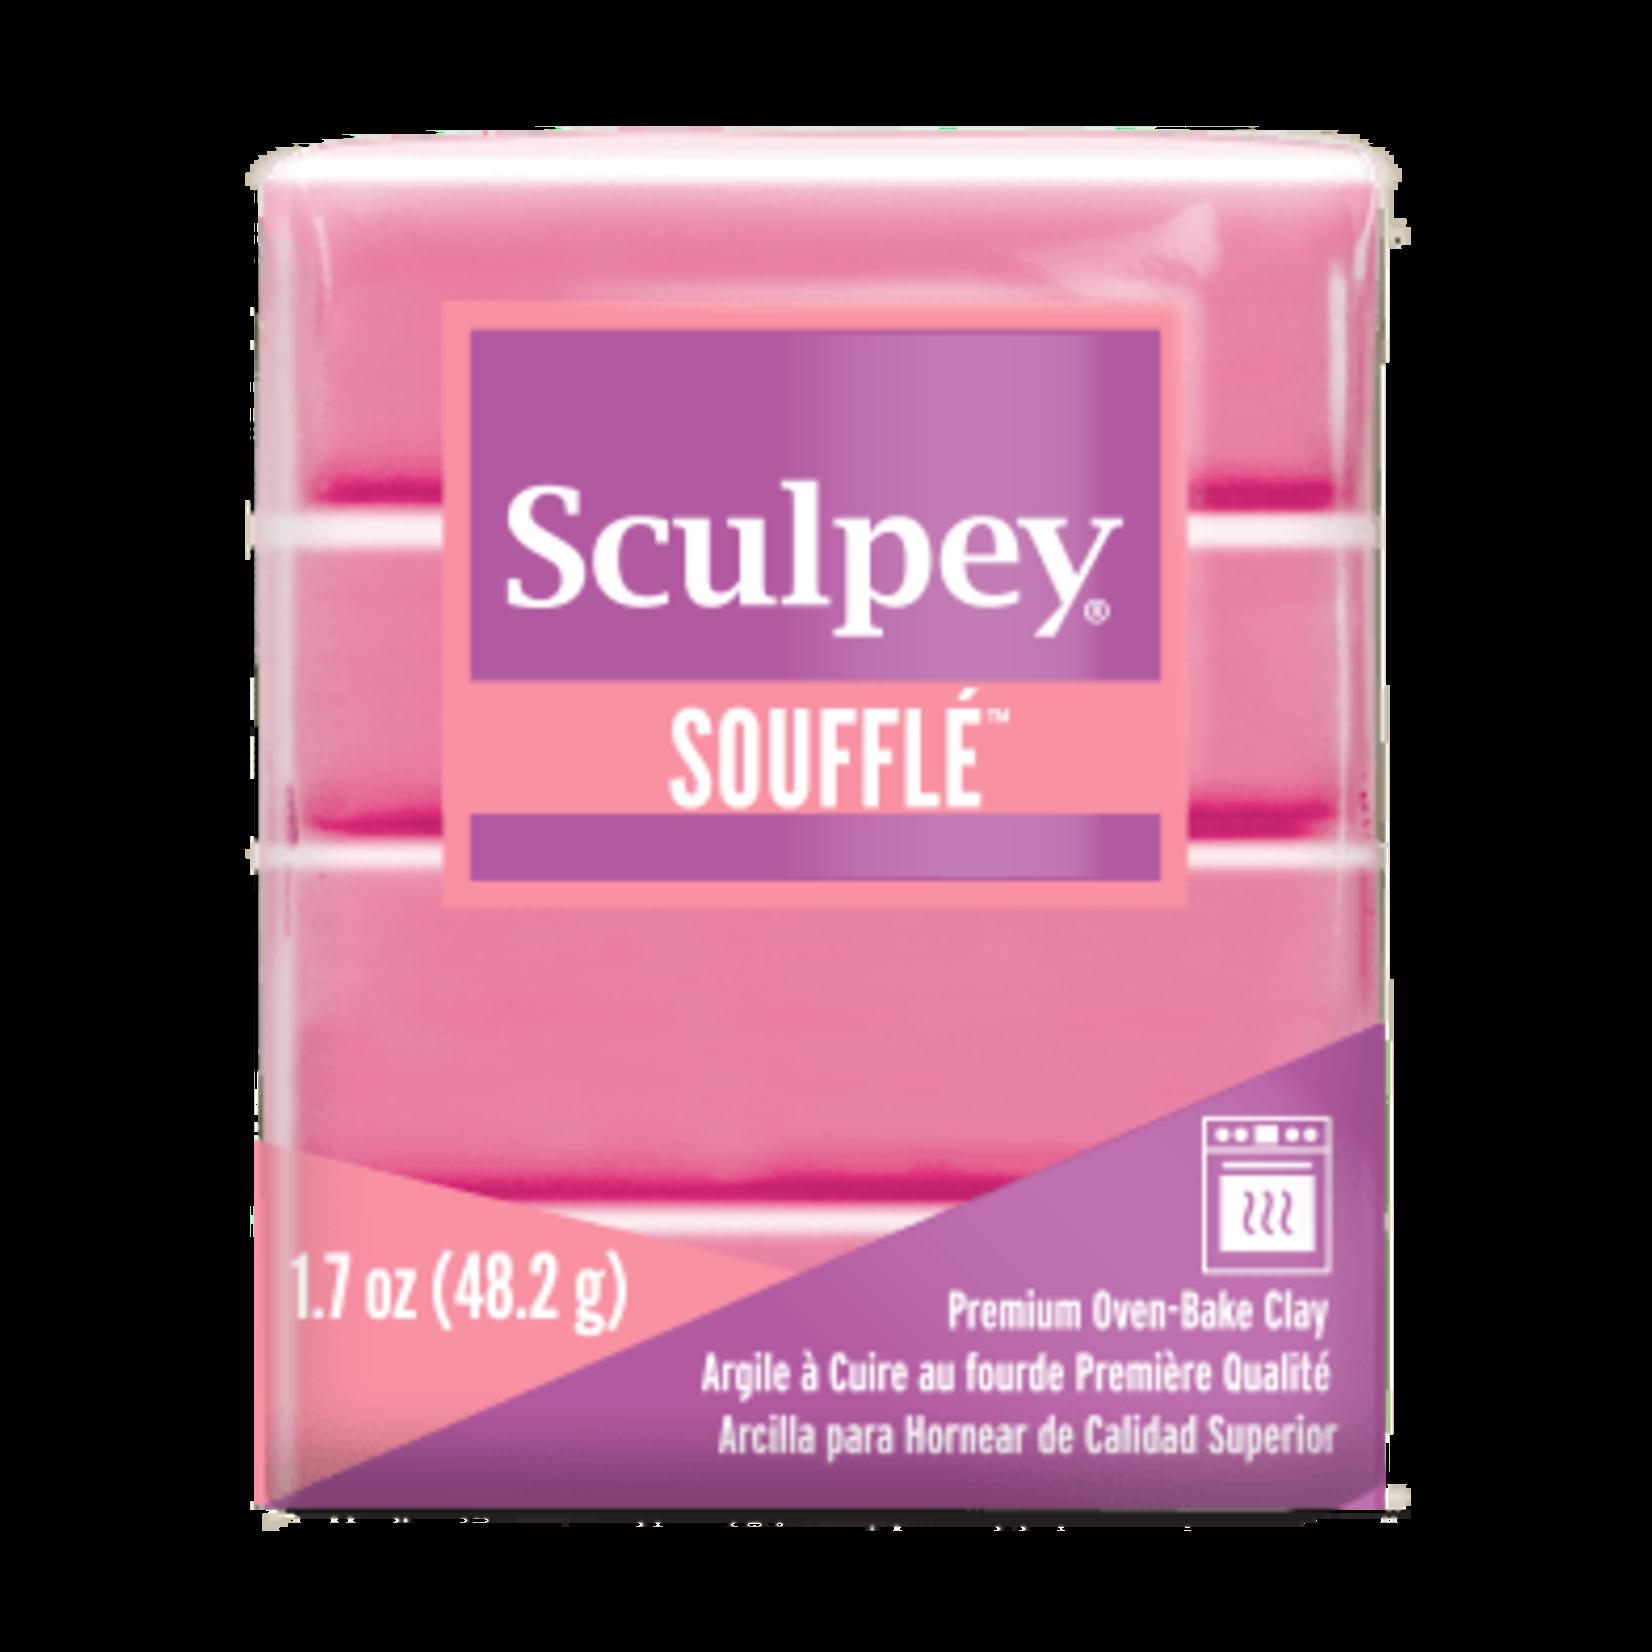 Sculpey Sculpey Souffle -- Guava